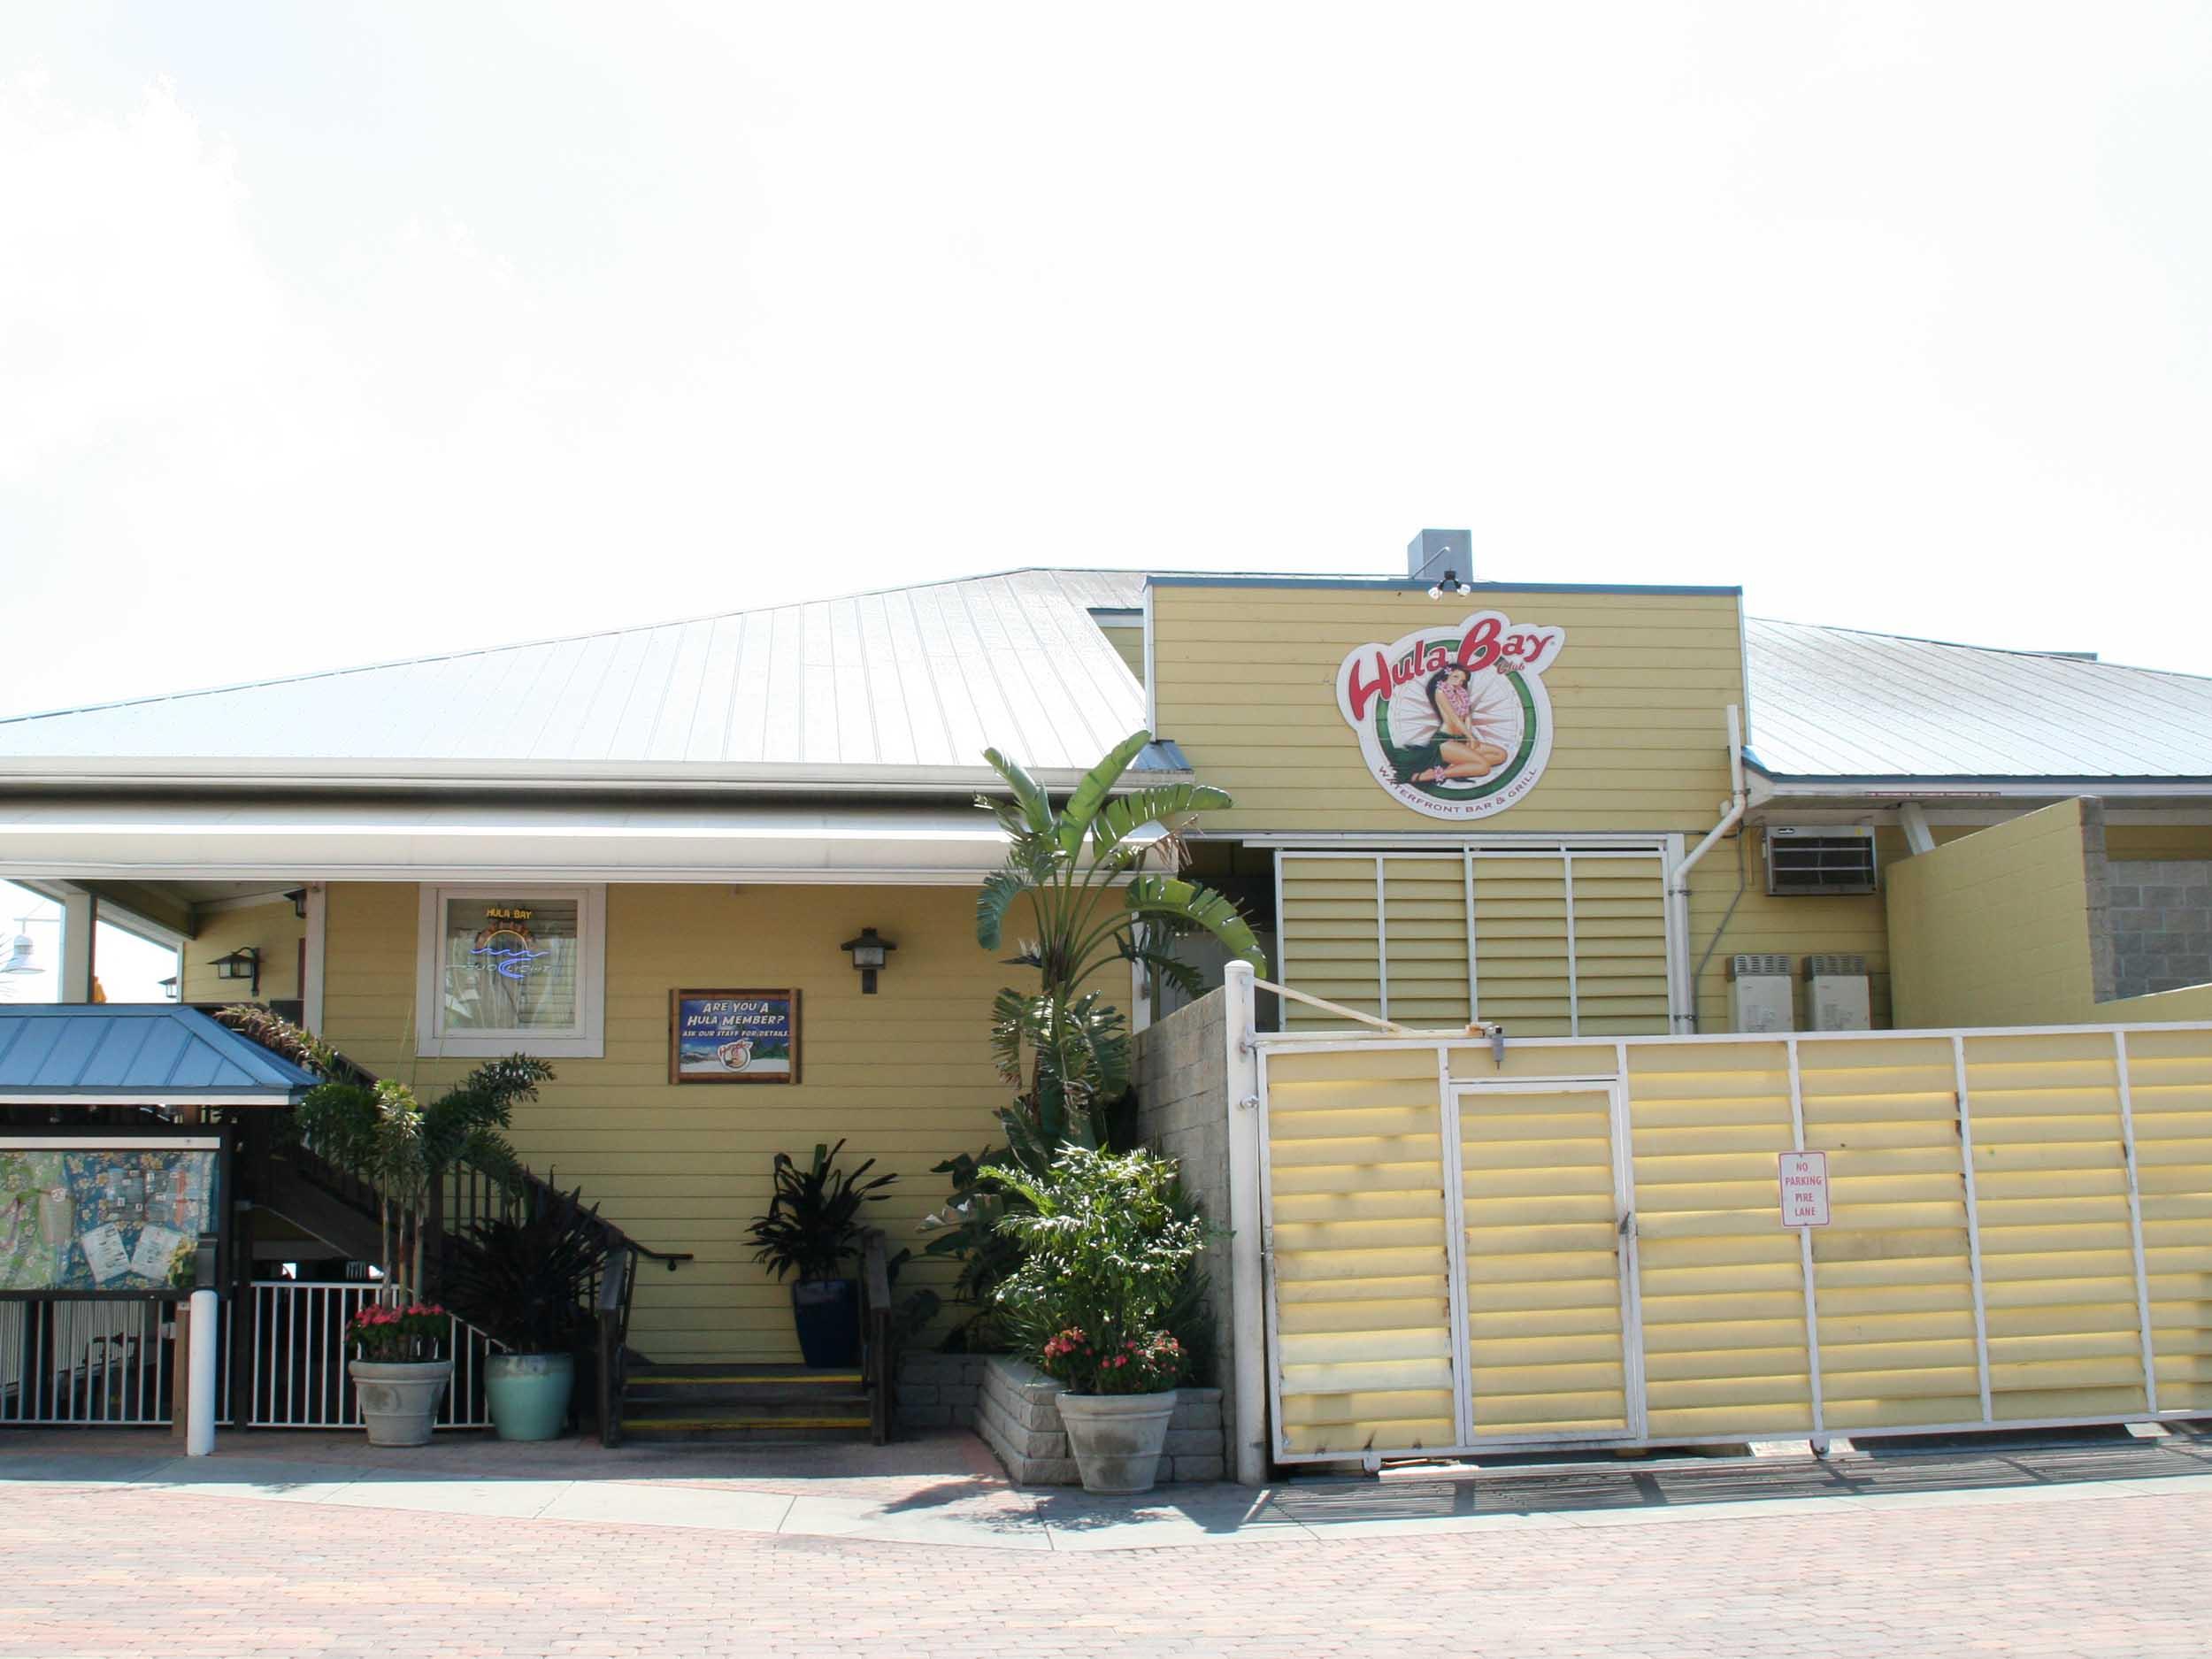 Hula Bay Club and Duke's Retired Surfer's Island Club Entrance